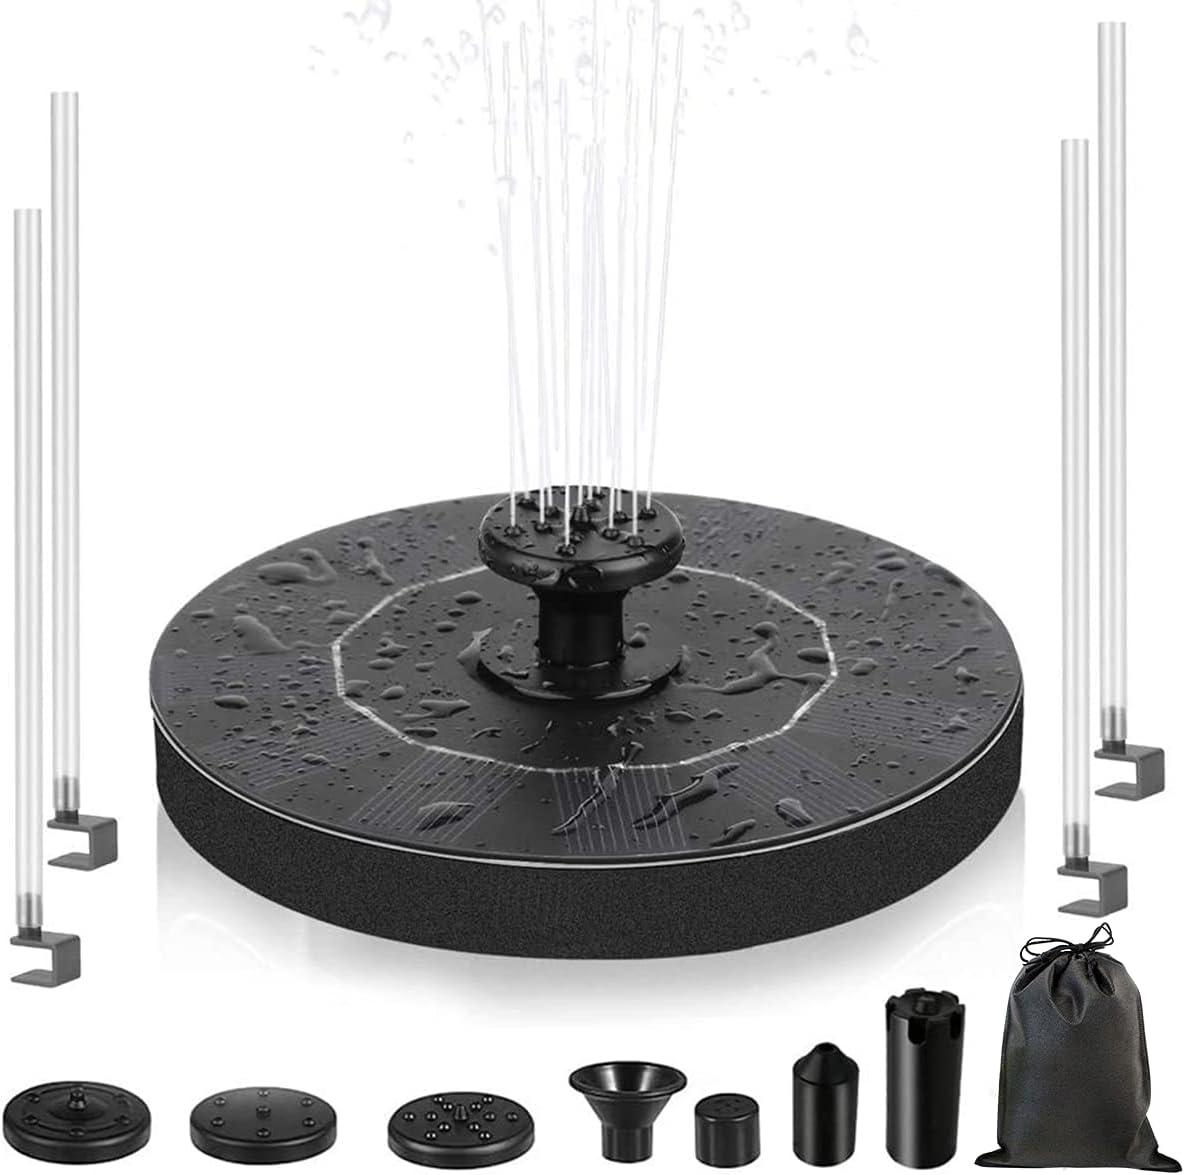 Special sale item Solar Bird Bath Fountain Upgrade Over item handling ☆ 1.4W with Pump